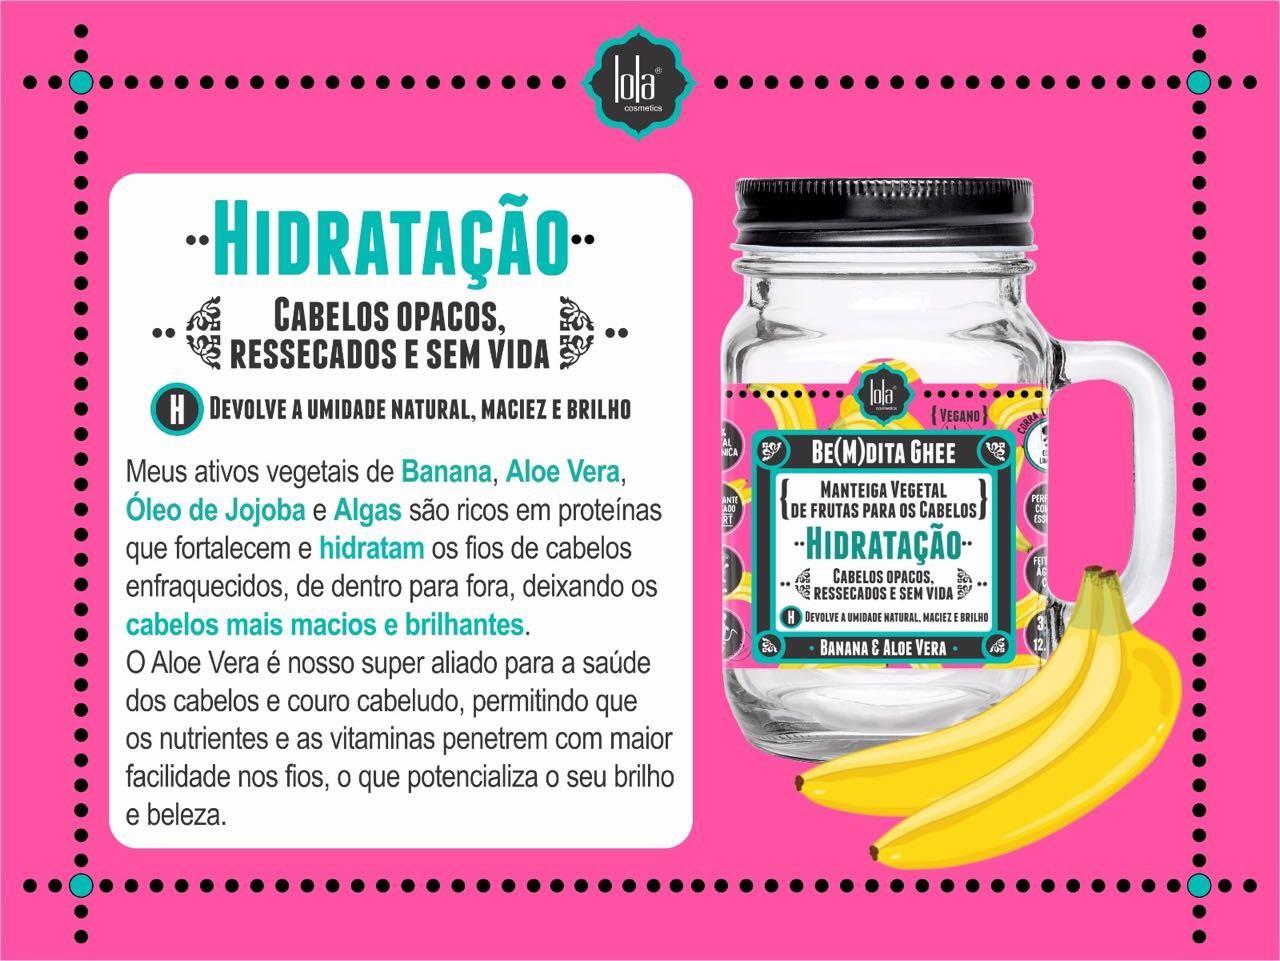 Lola Cosmetics Be(m)dita Ghee Banana e Aloe Vera Máscara de Hidratação 250g